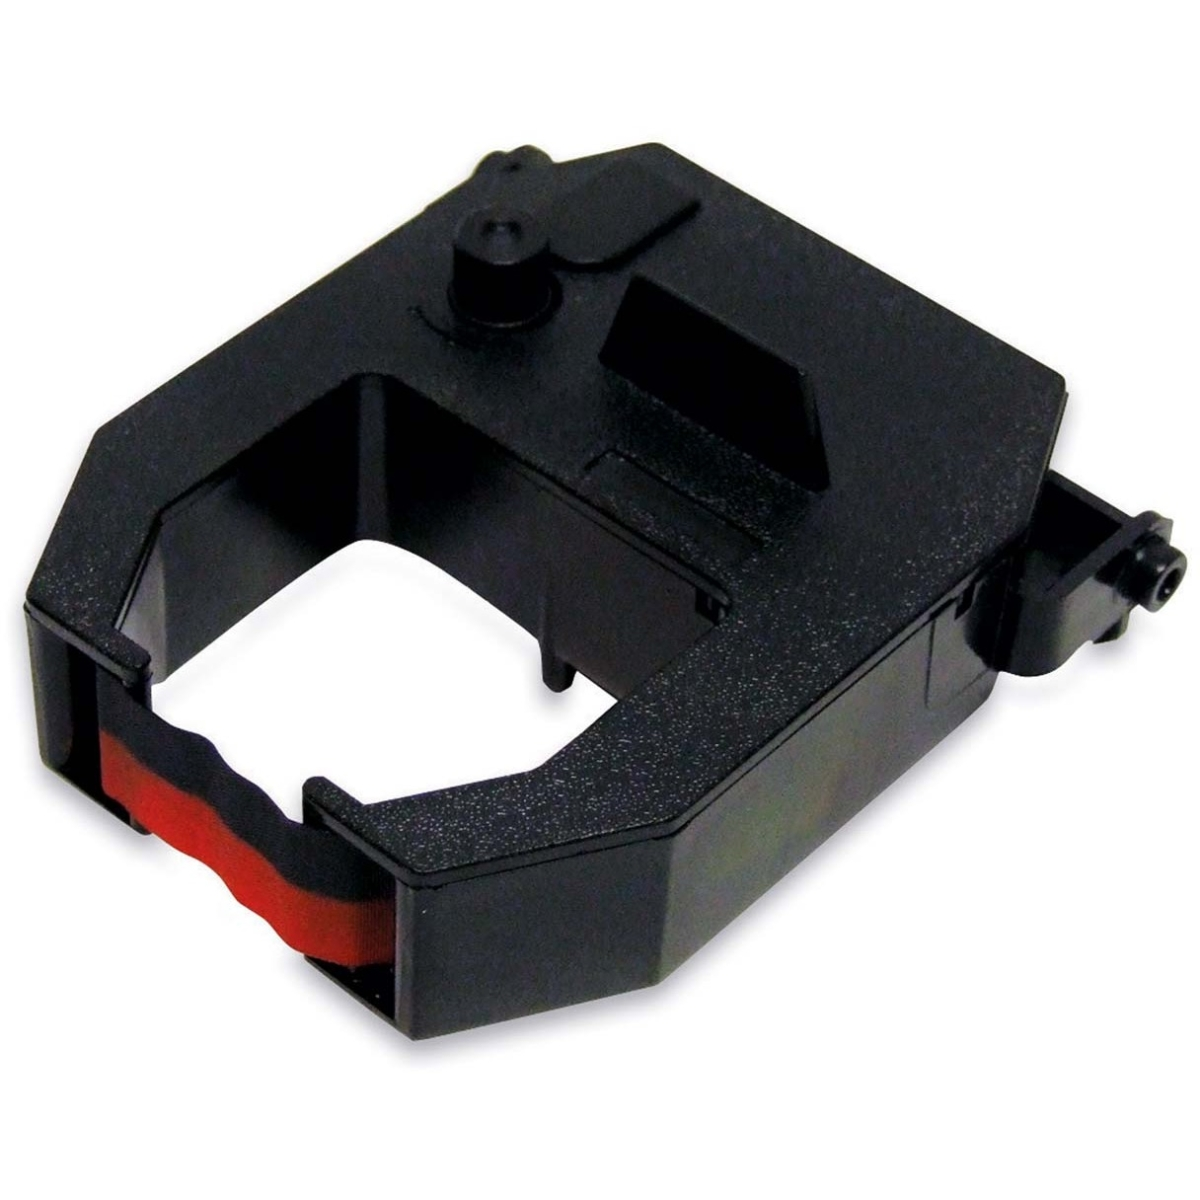 Replacement Ribbon for 2600 & 2650 Time Clocks - Black Red - Dot Matrix - 1 Each